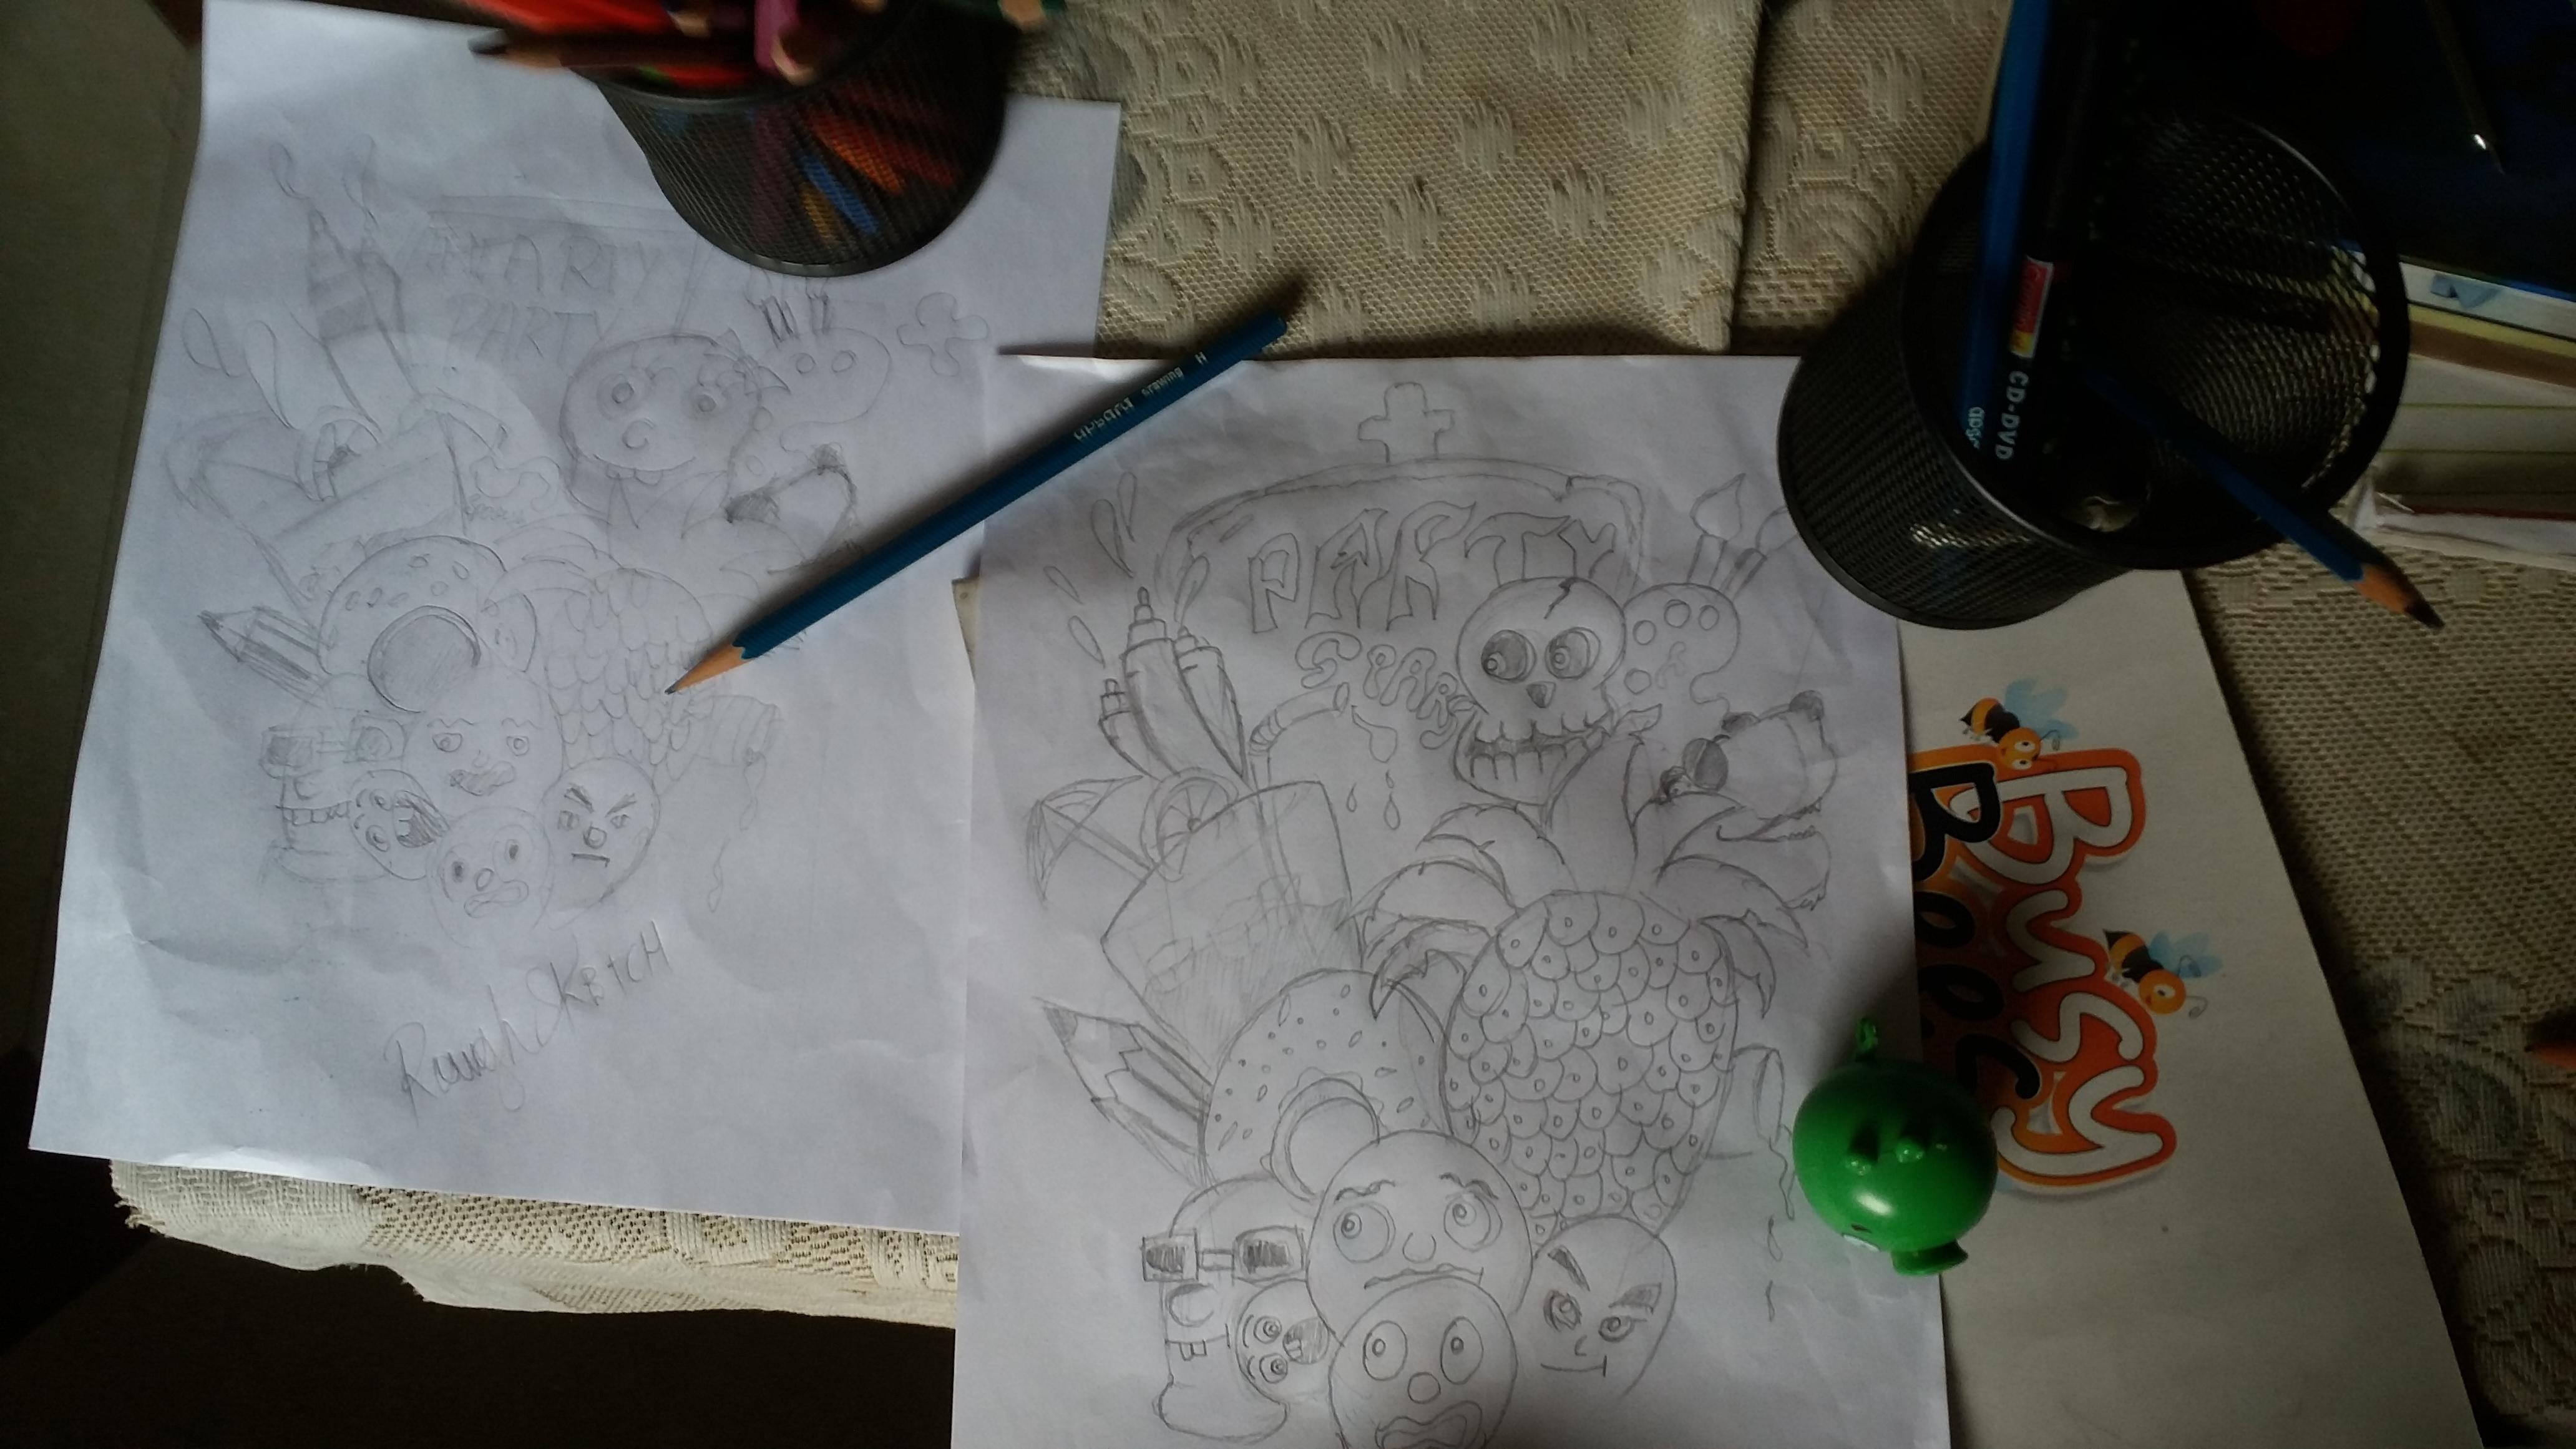 MID PROCESS OF COTM ARTYSHIRT